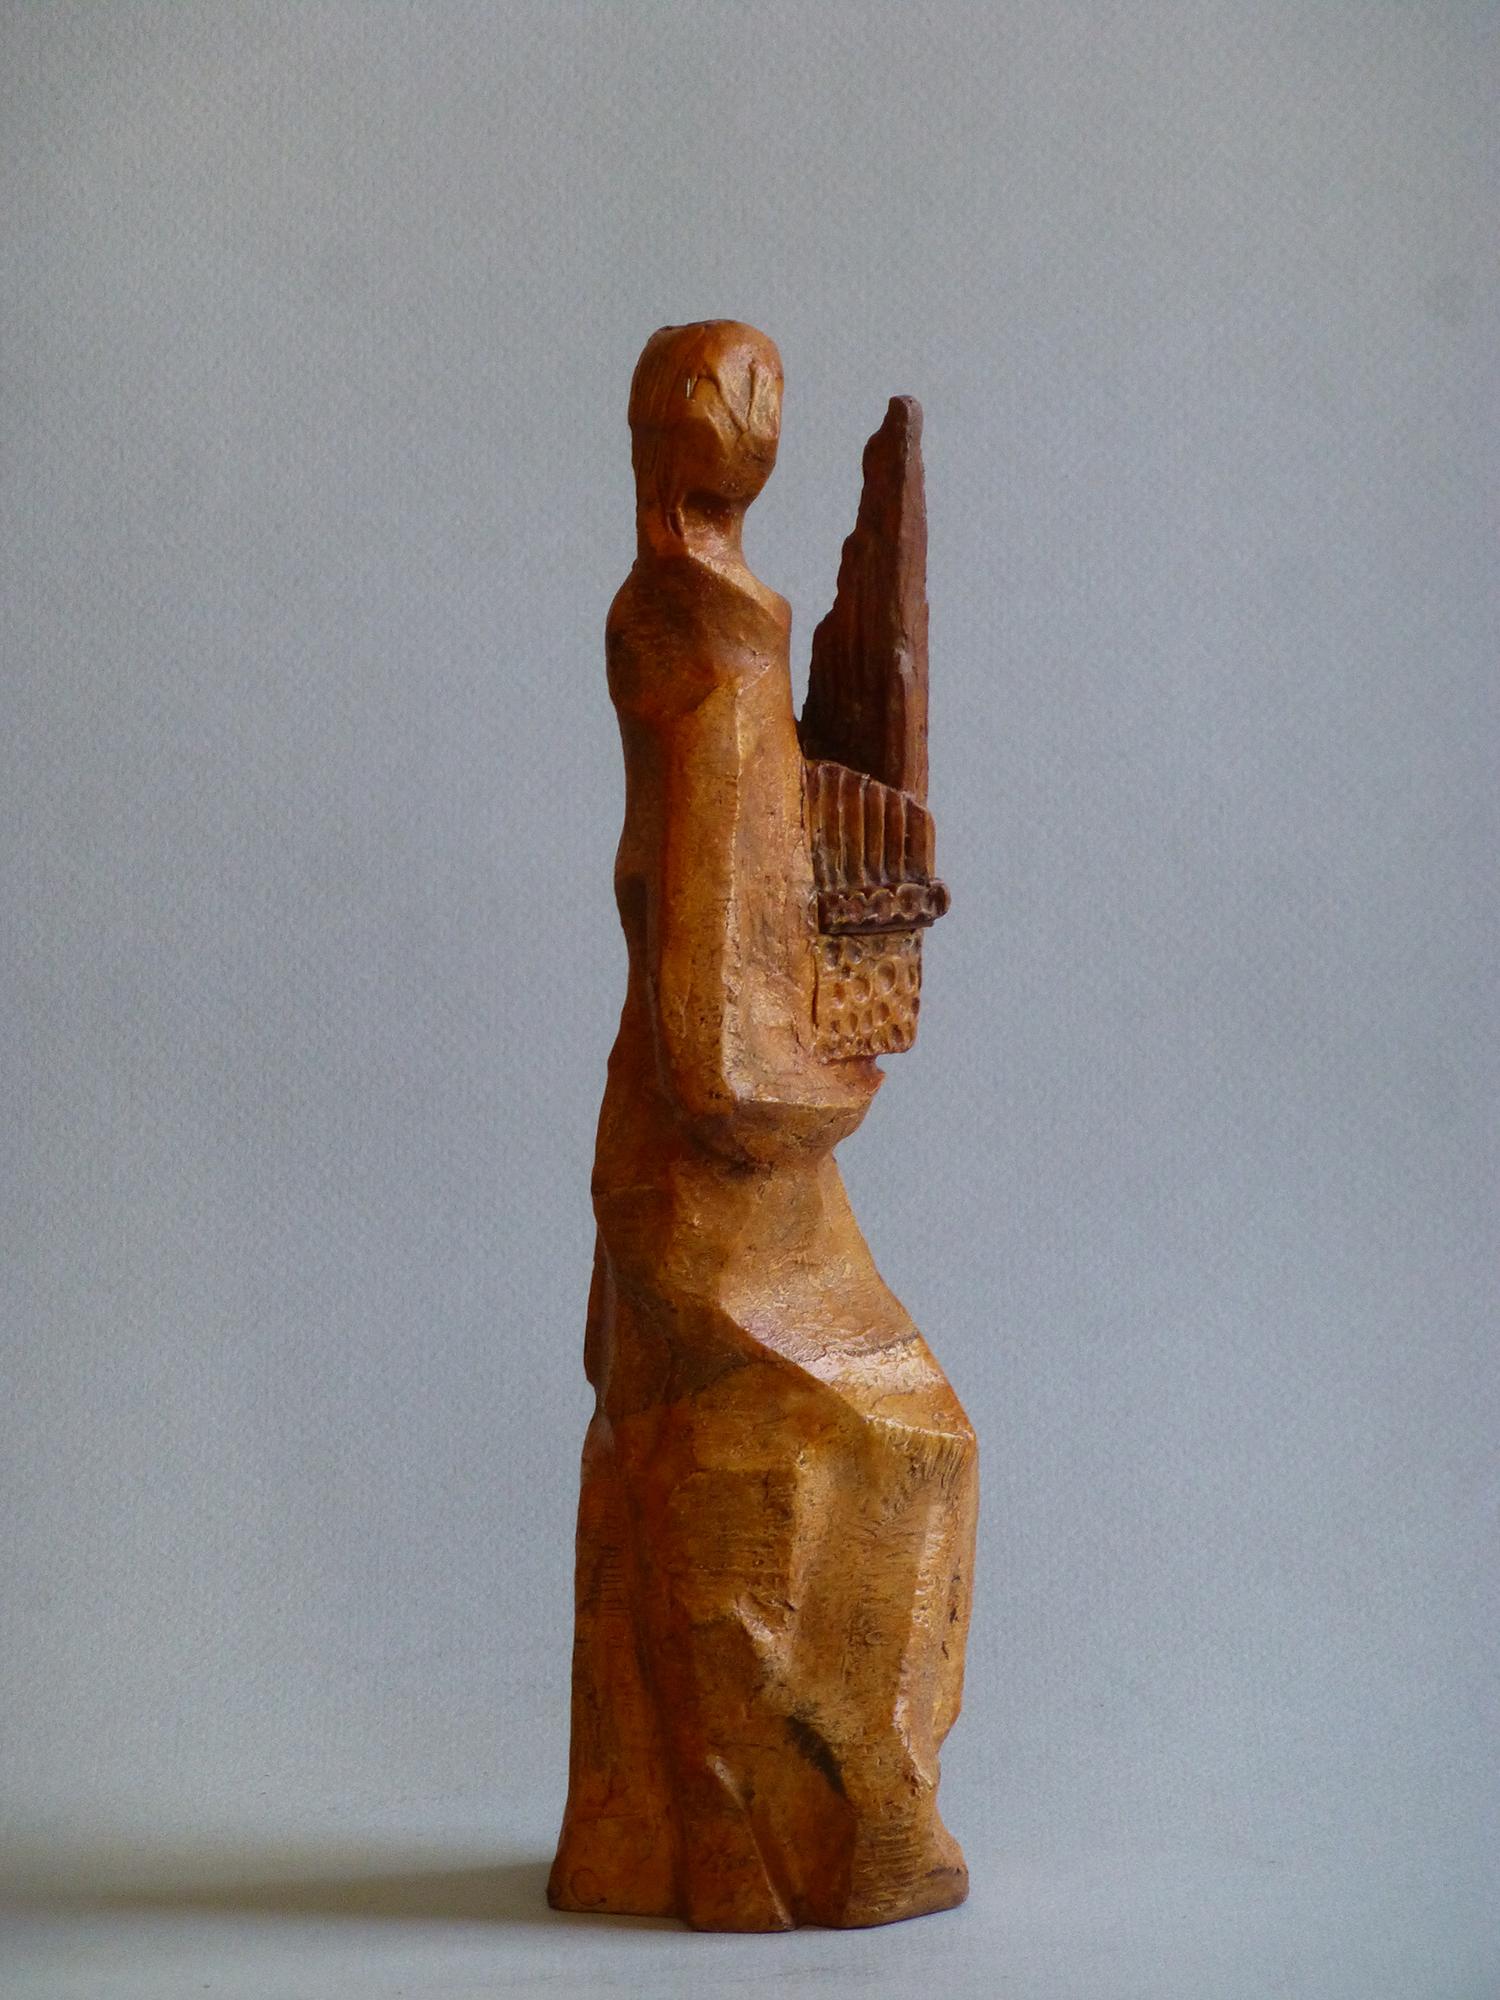 1968.1. A la Música, trofeo, bronce, 24x7x6 cms. 1º Concurso Interpretación Musical. R.N.E. 1968